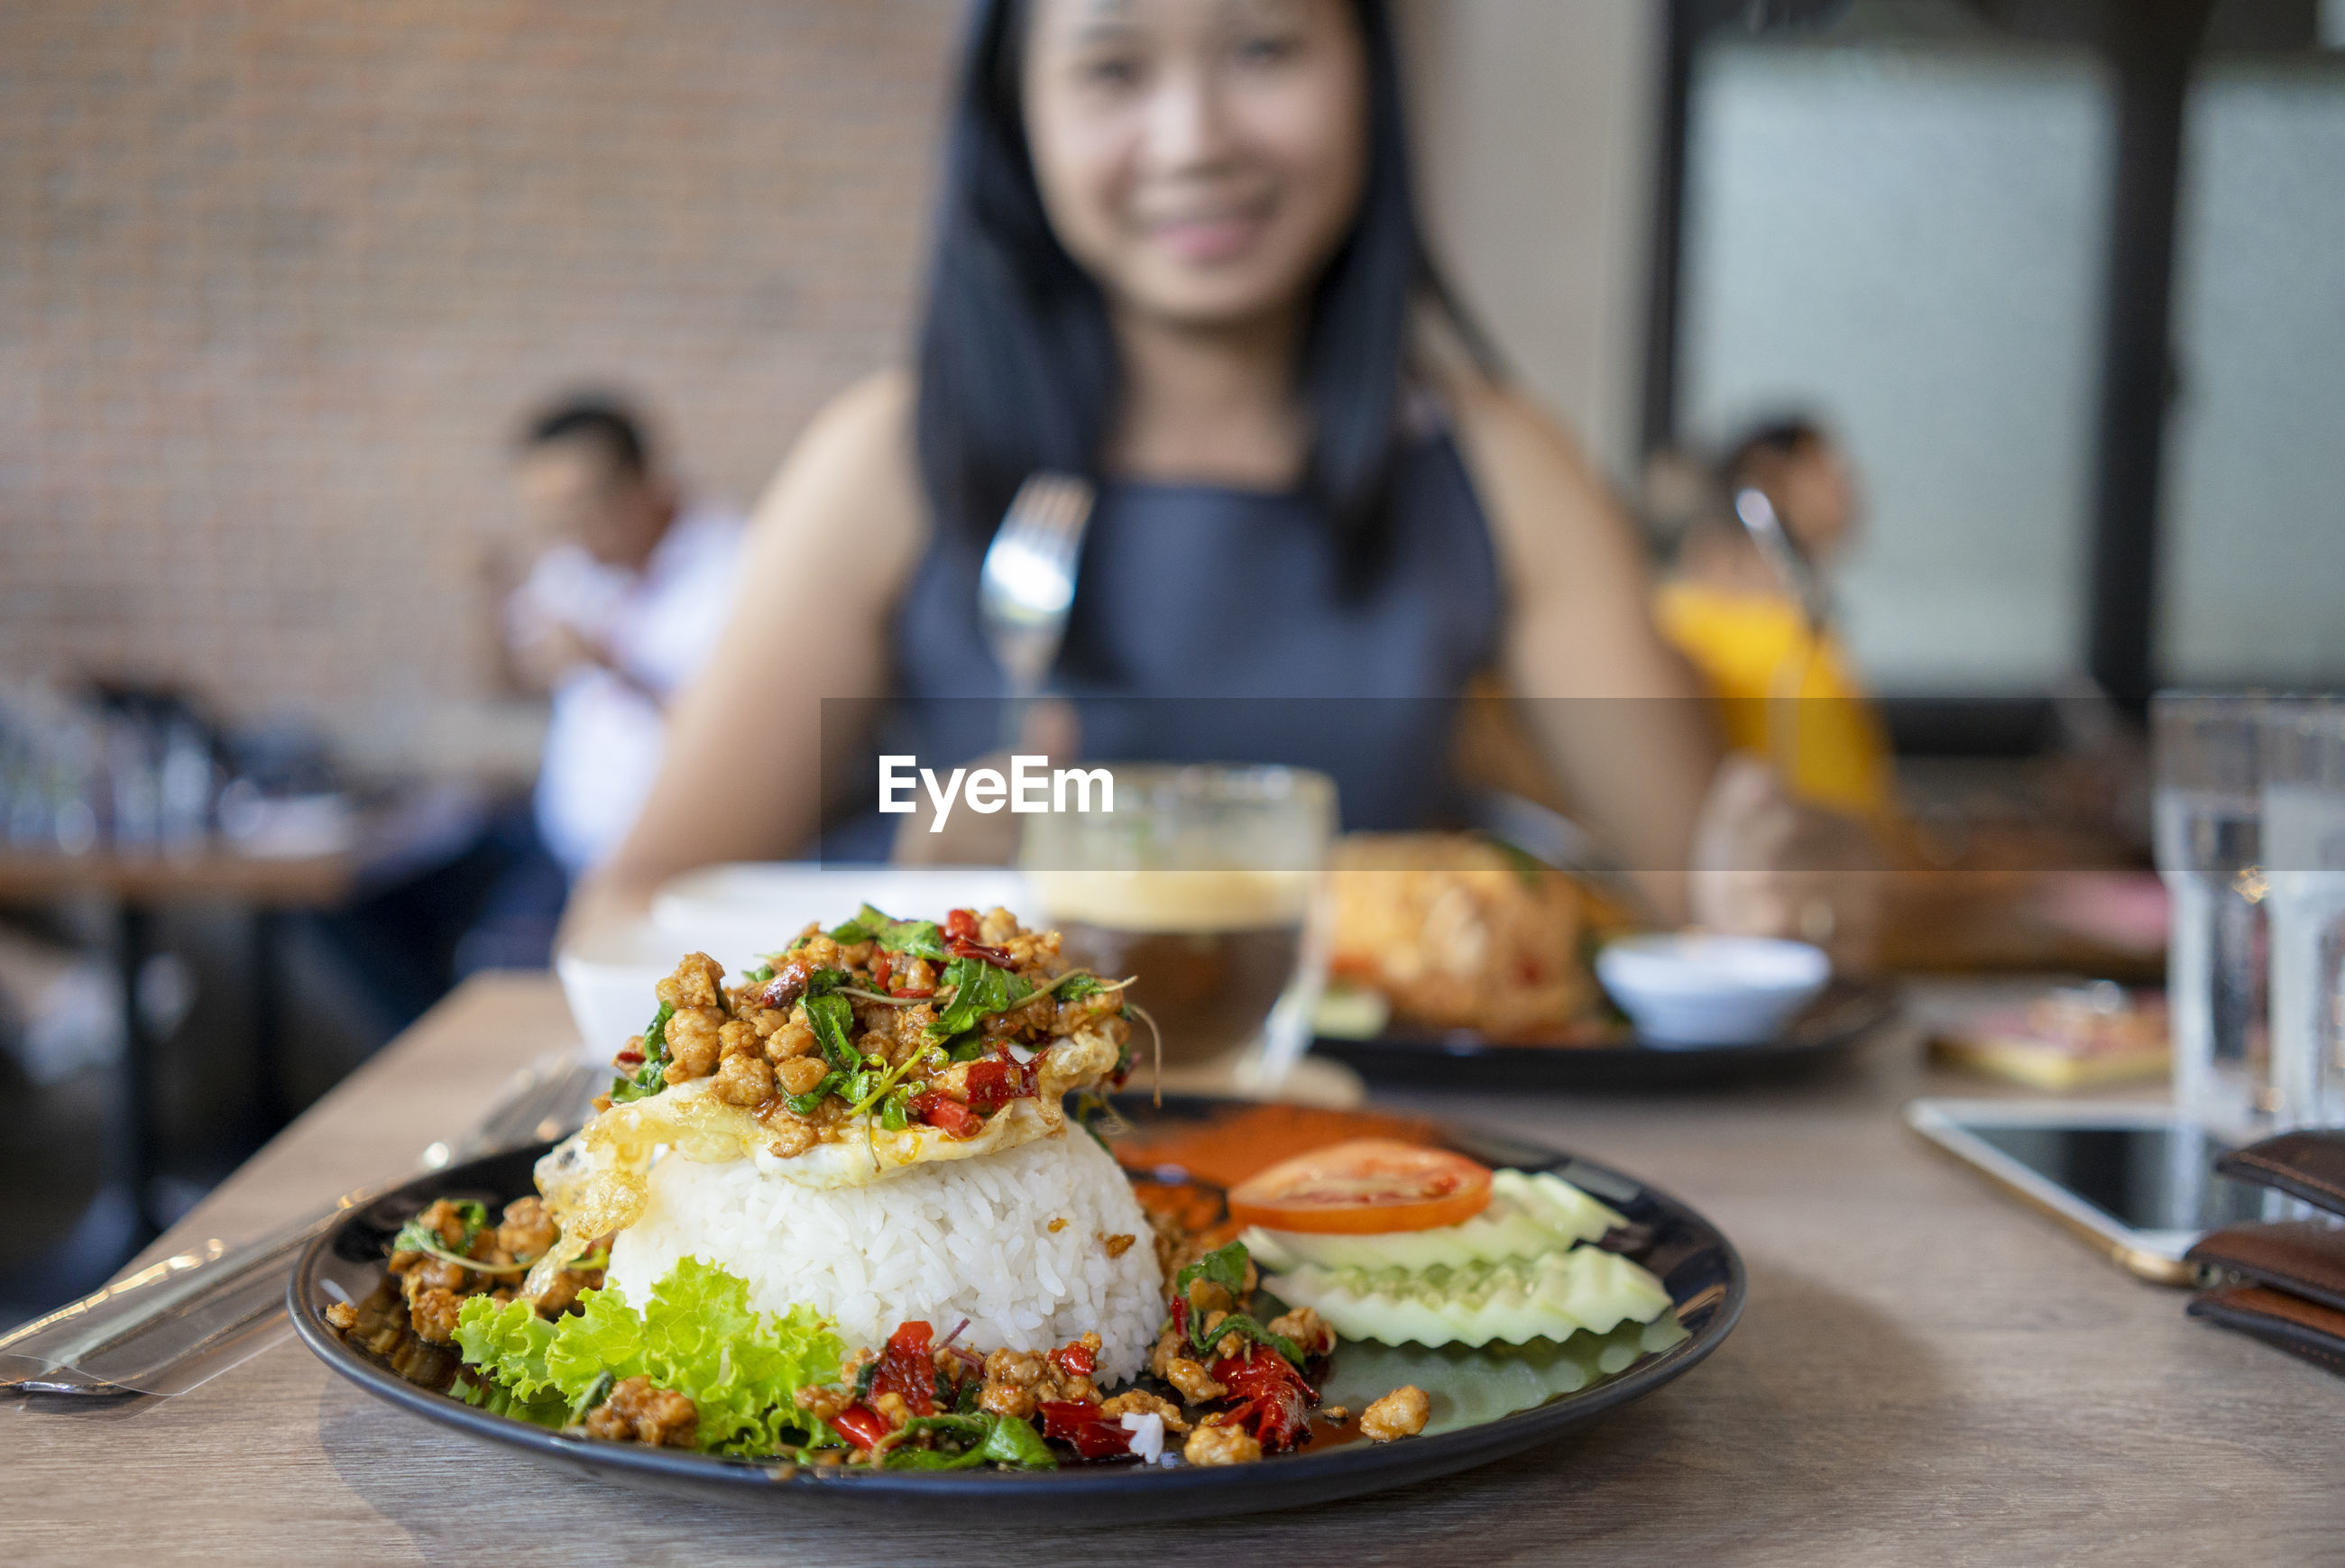 Portrait of woman having food in restaurant